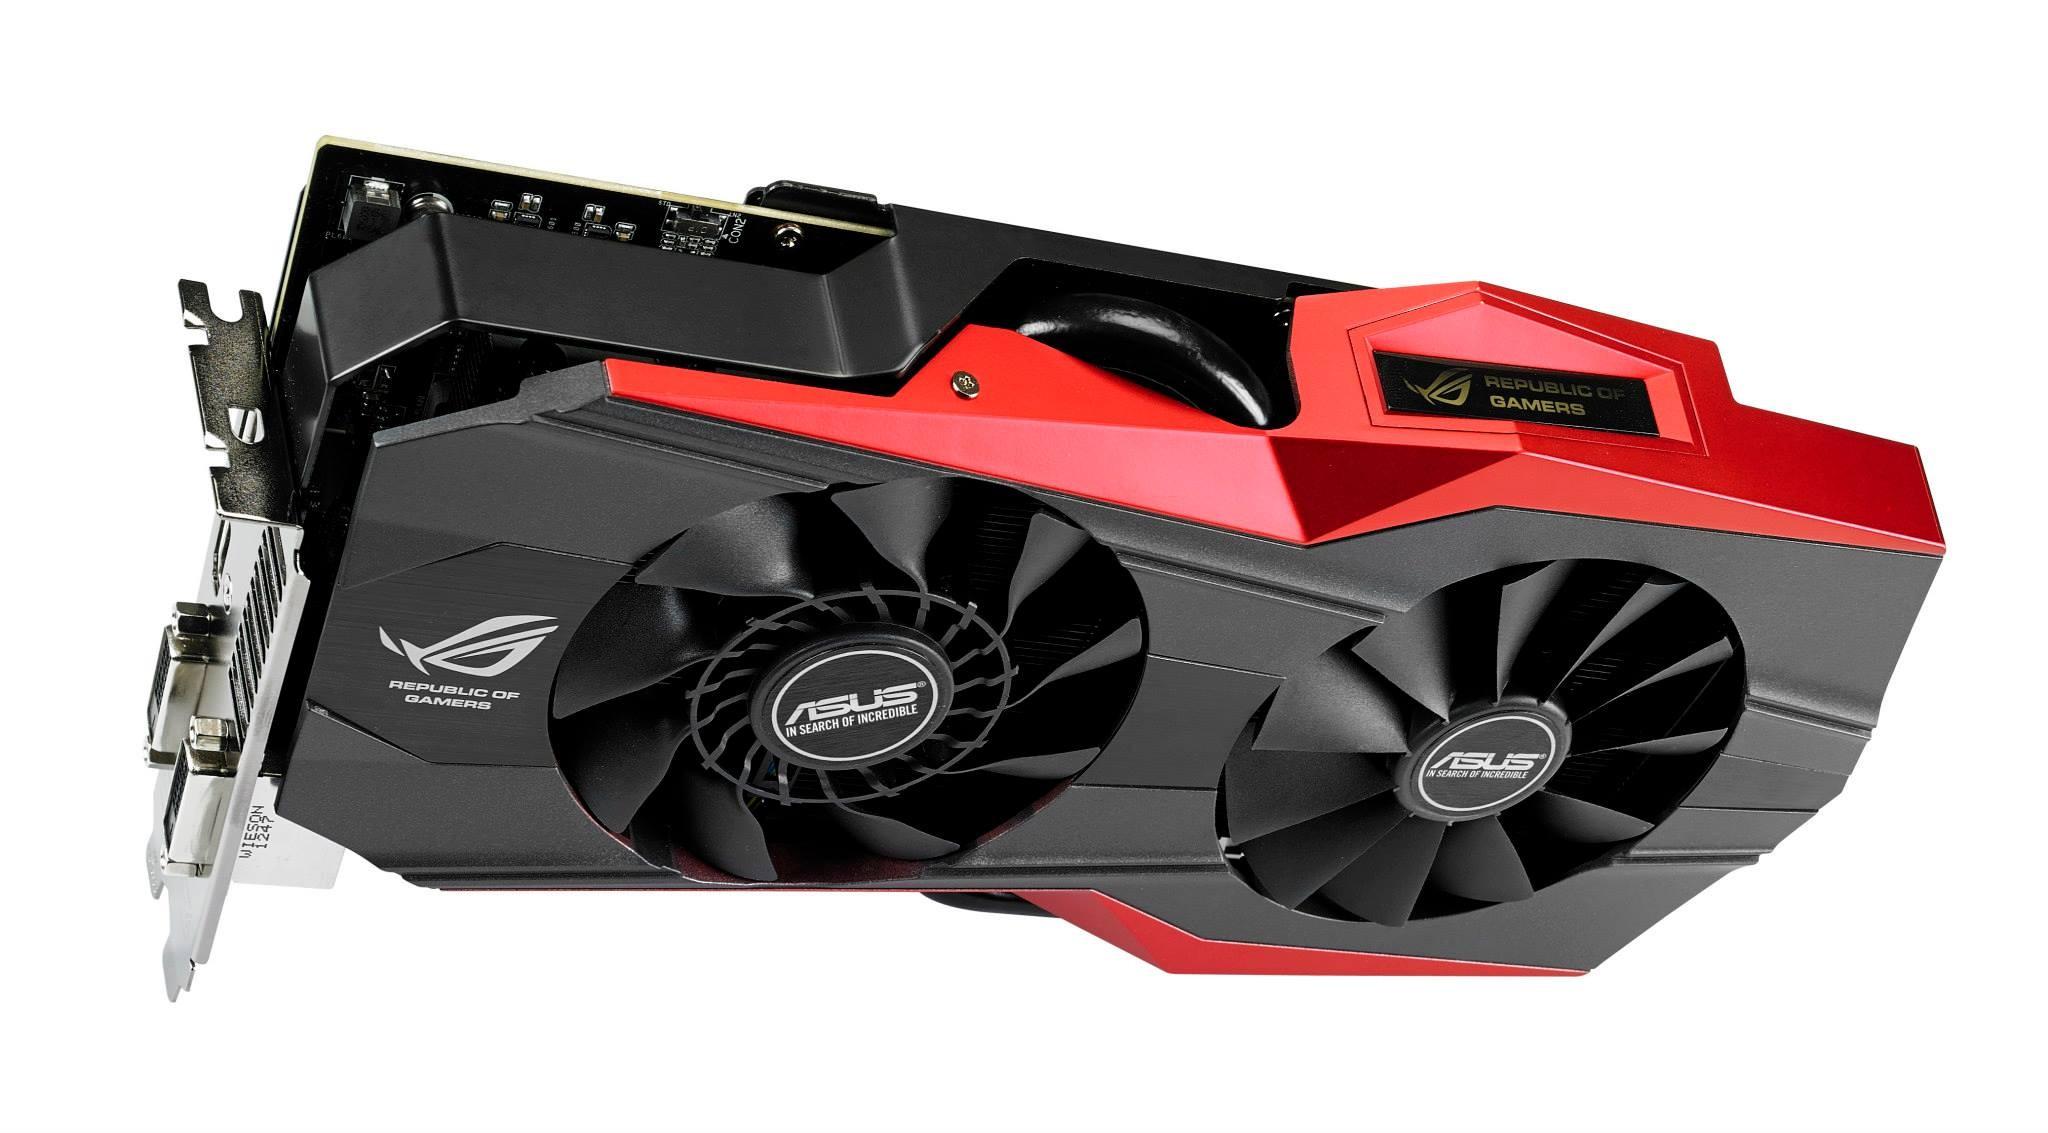 ASUS Reveals The ROG MATRIX R9 290X And MATRIX GTX 780 Ti Graphics Cards TechPowerUp Forums